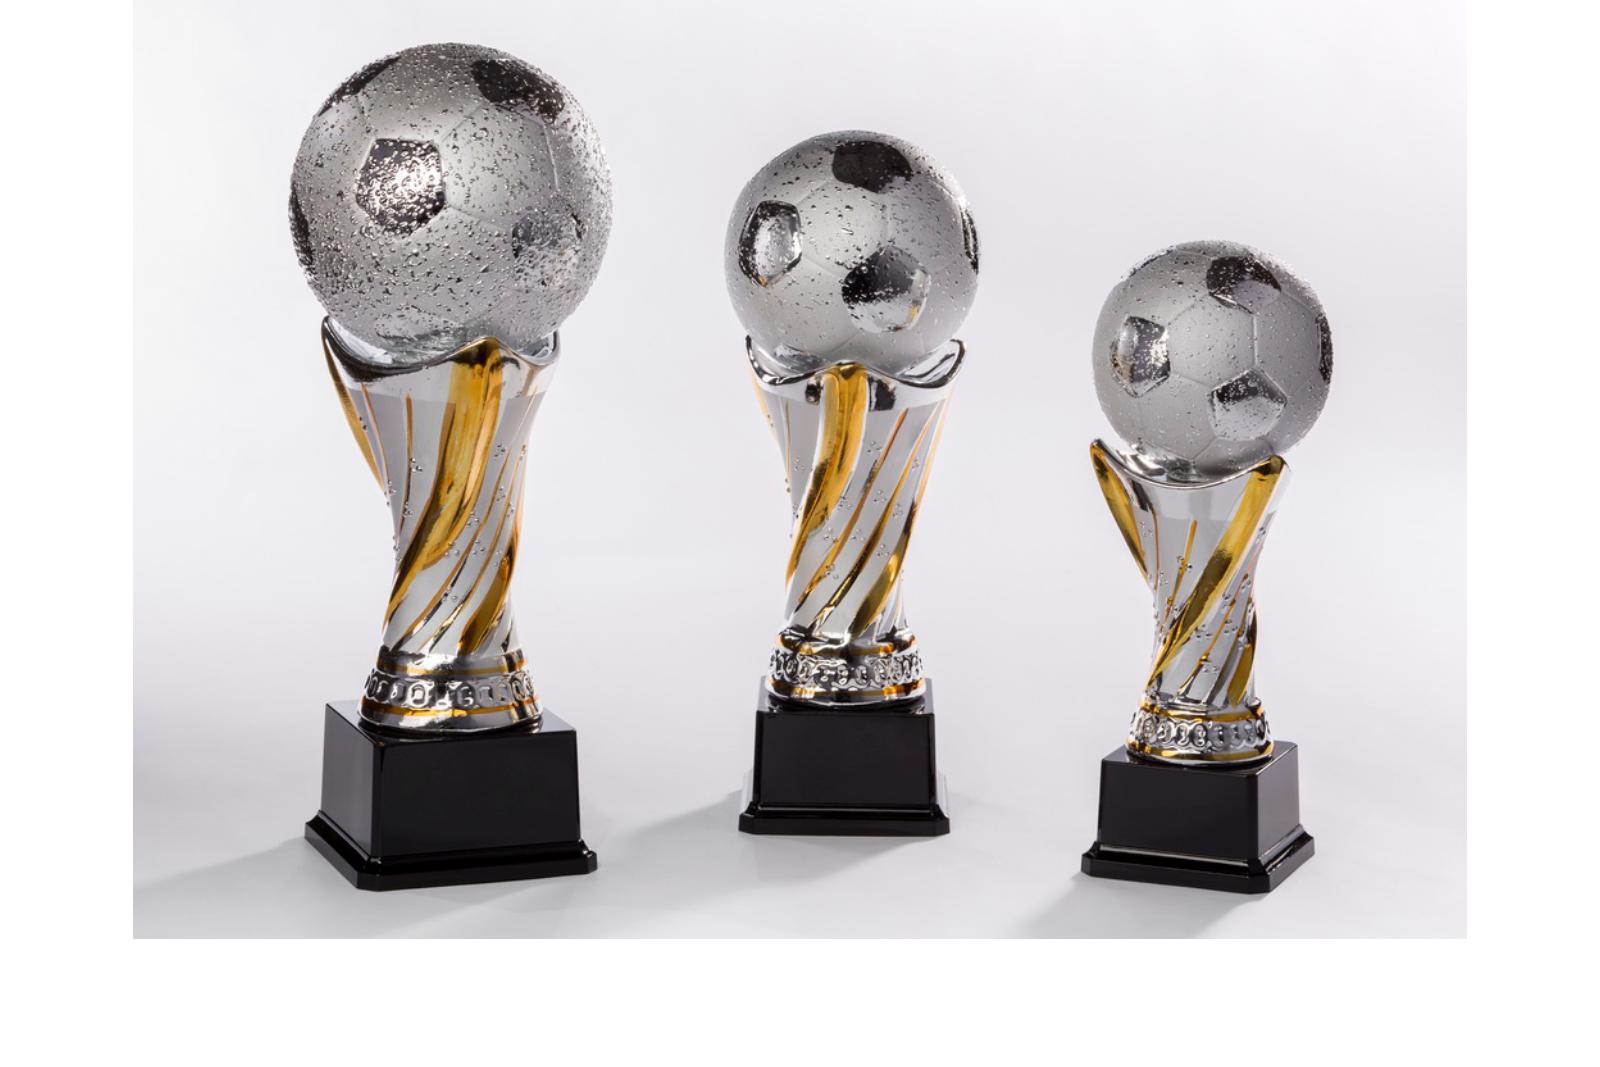 Pokal mit Fußball